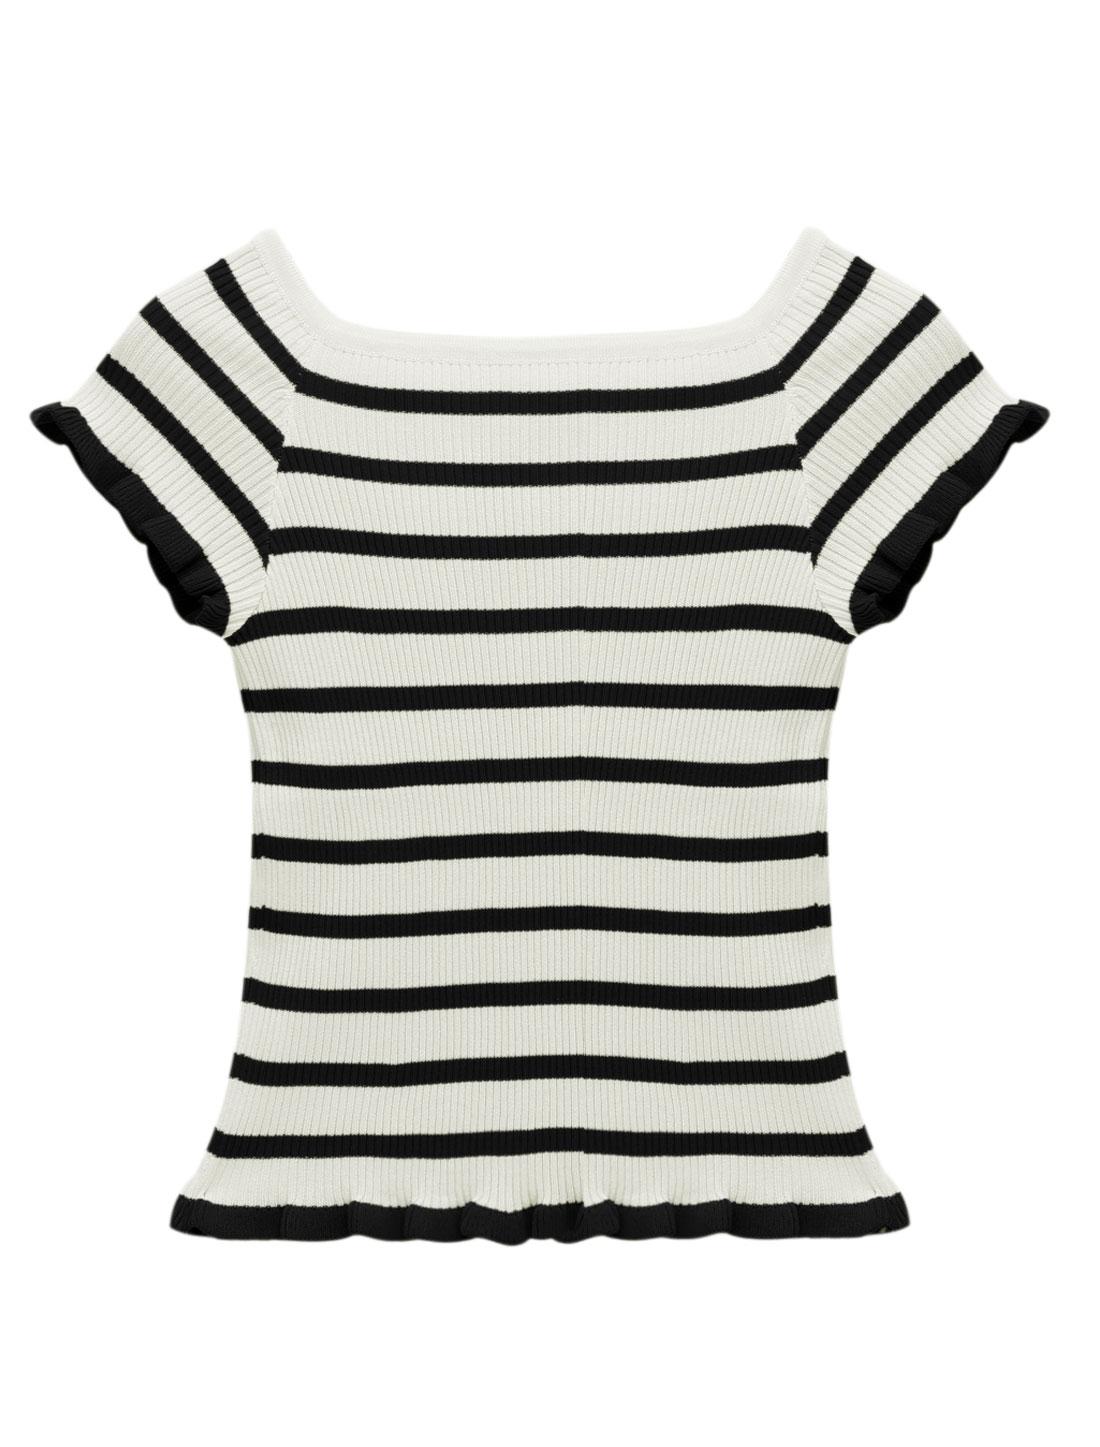 Woman Stripes Boat Neck Ruffled Hem Short Sleeves Ribbed Knit Top Black XS